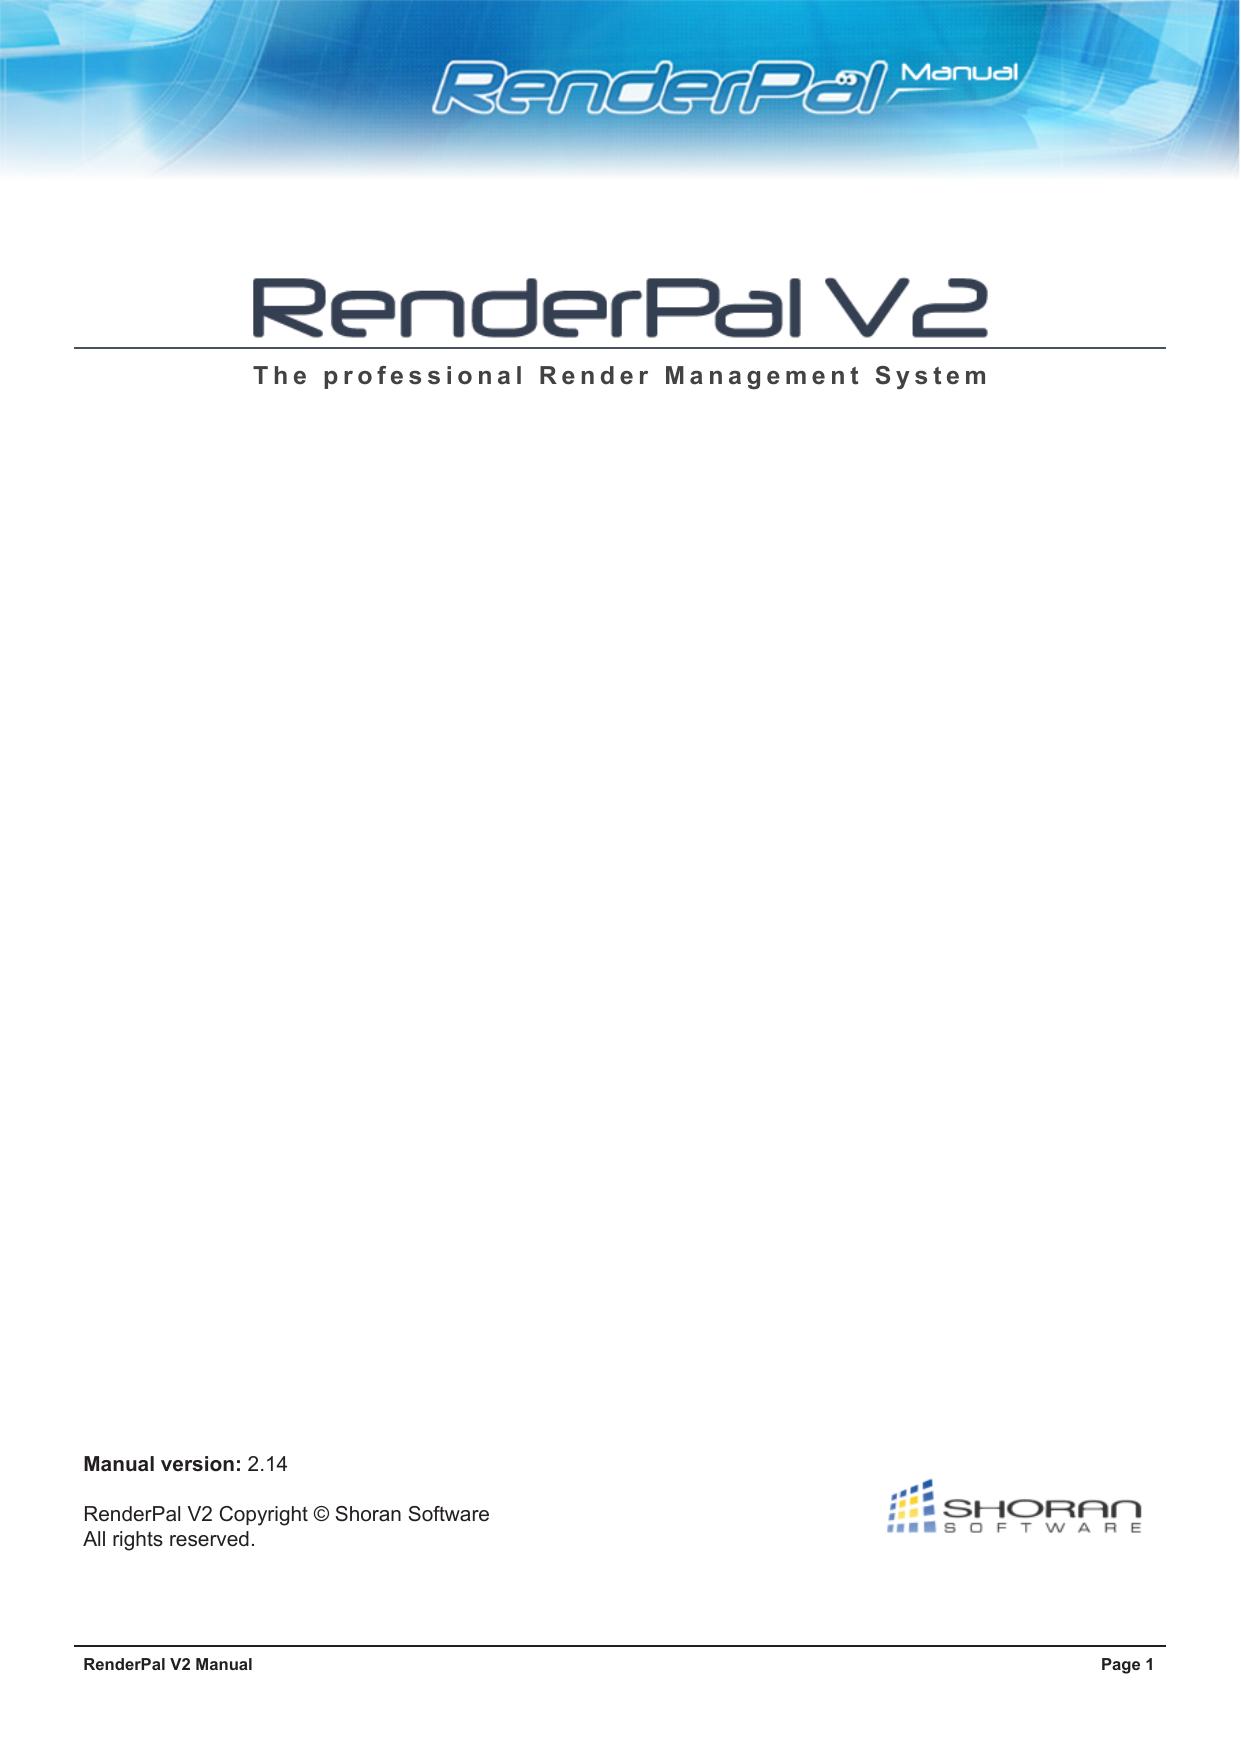 RenderPal V2 Manual | manualzz com